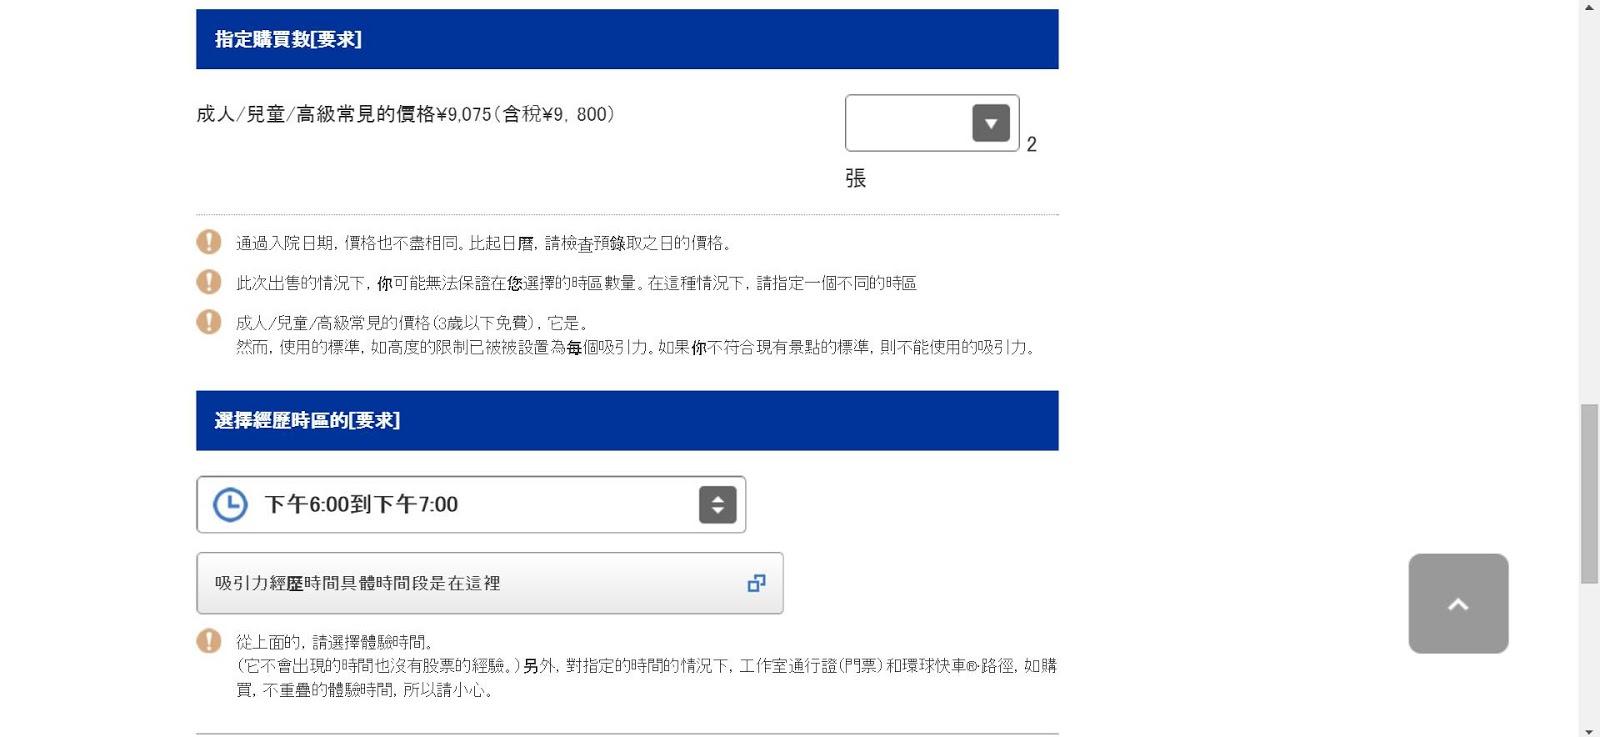 how to buy erimin 5 in japan